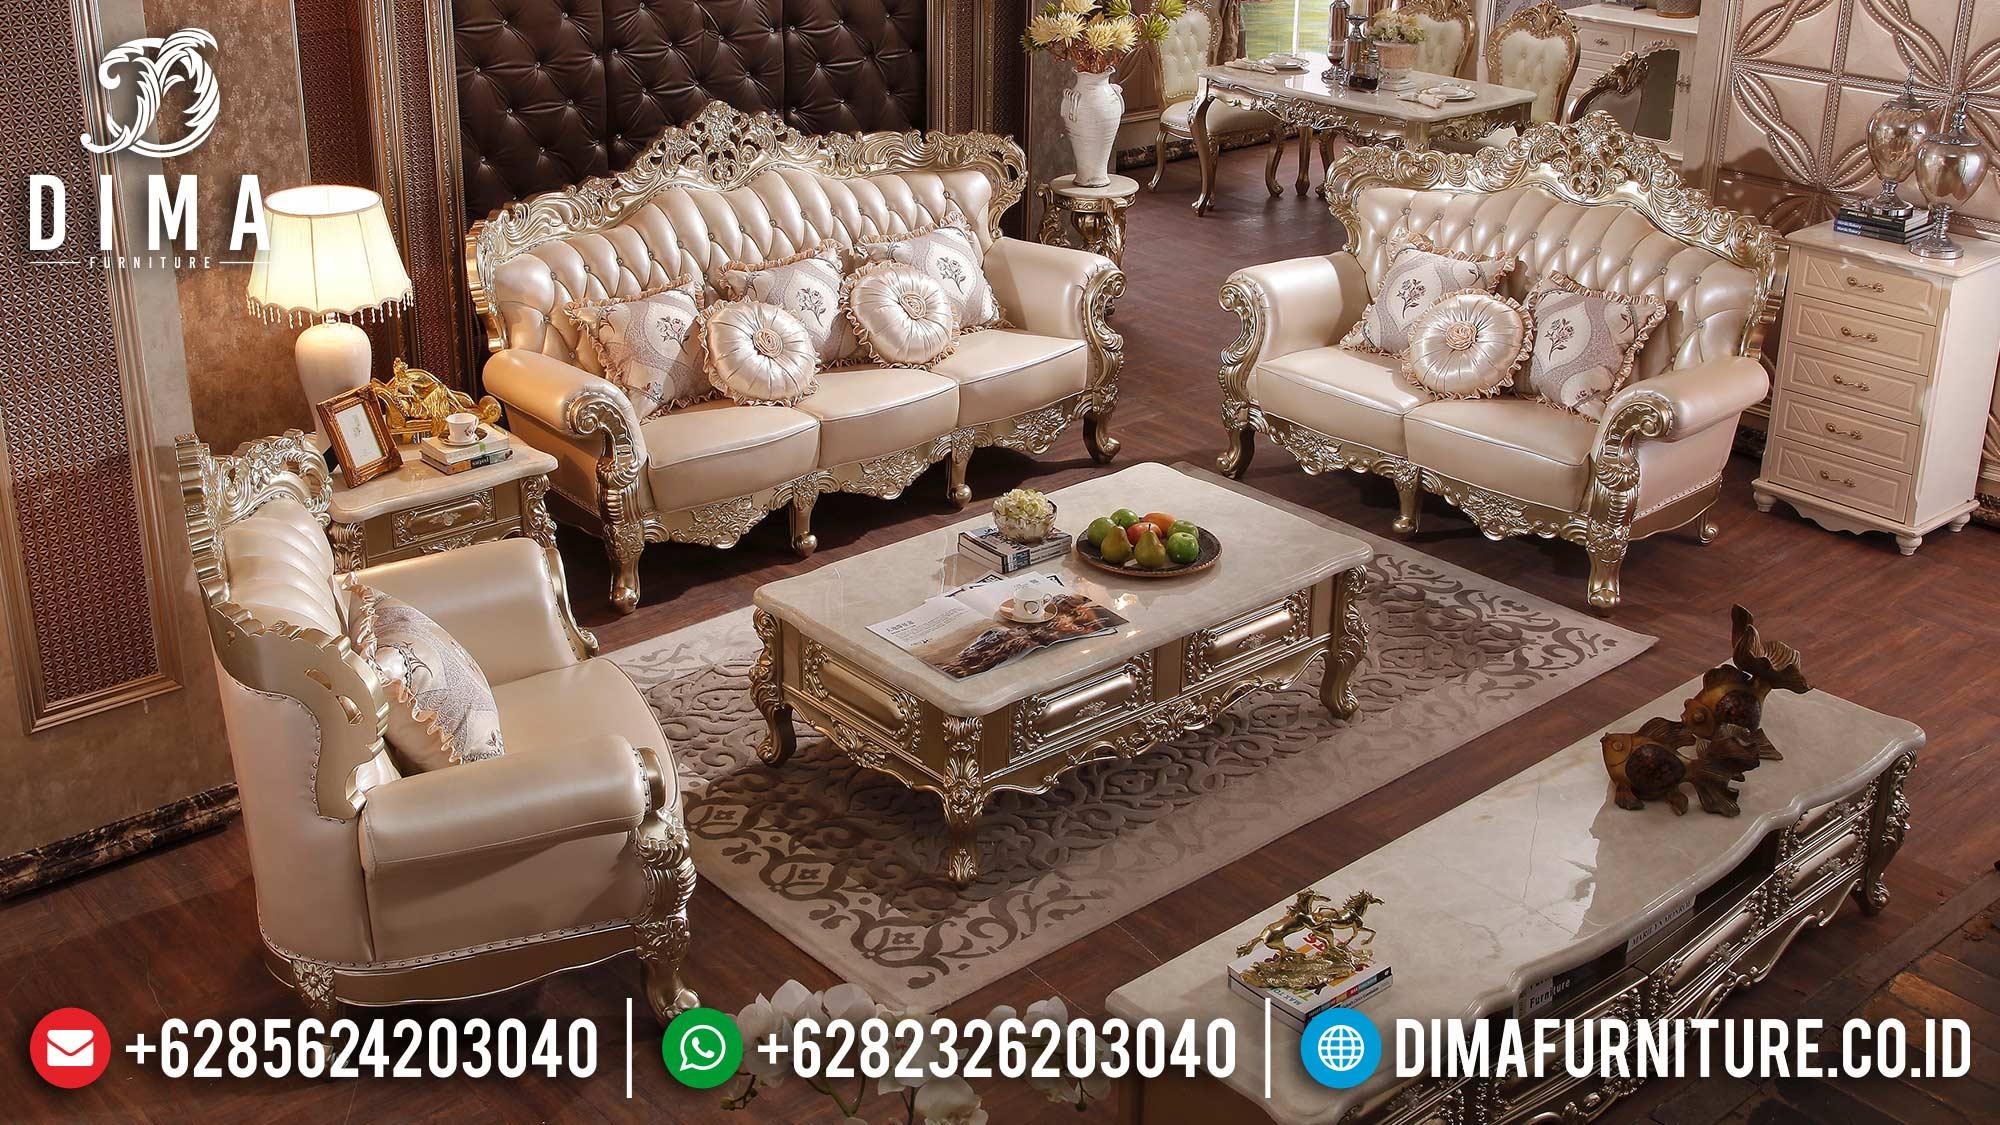 Big Sale Sofa Tamu Mewah Ukir Jepara Luxury Deluxe Carving Design ST-1351